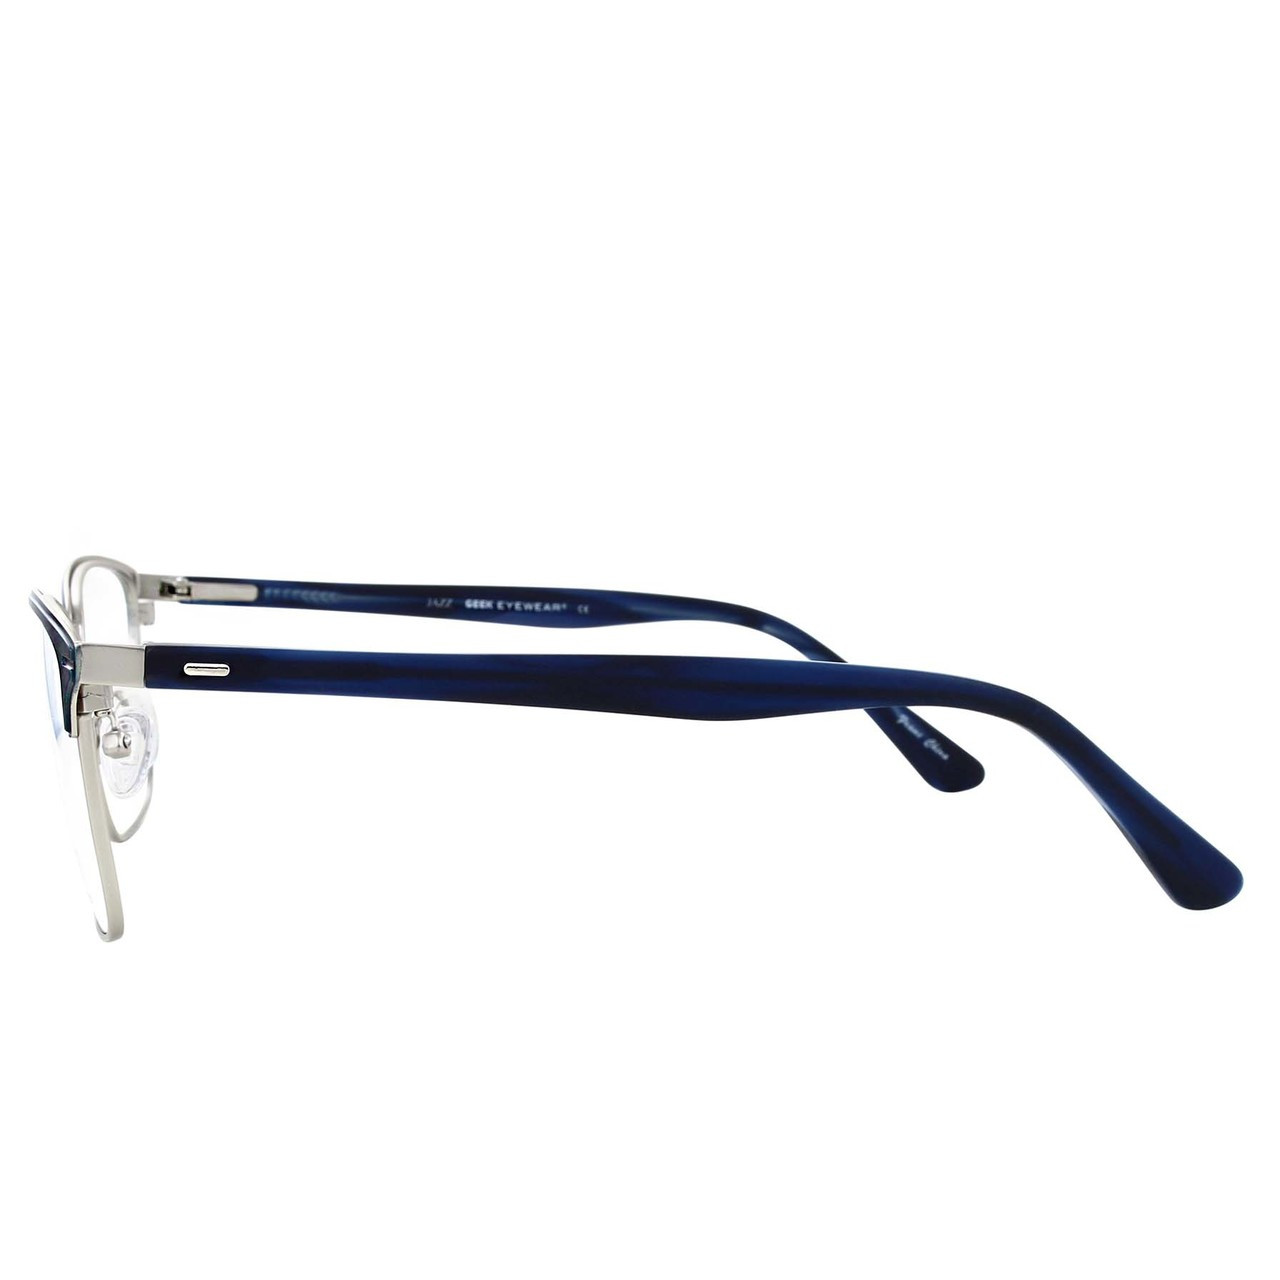 GEEK Eyewear GEEK JAZZ Blue Silver Frame